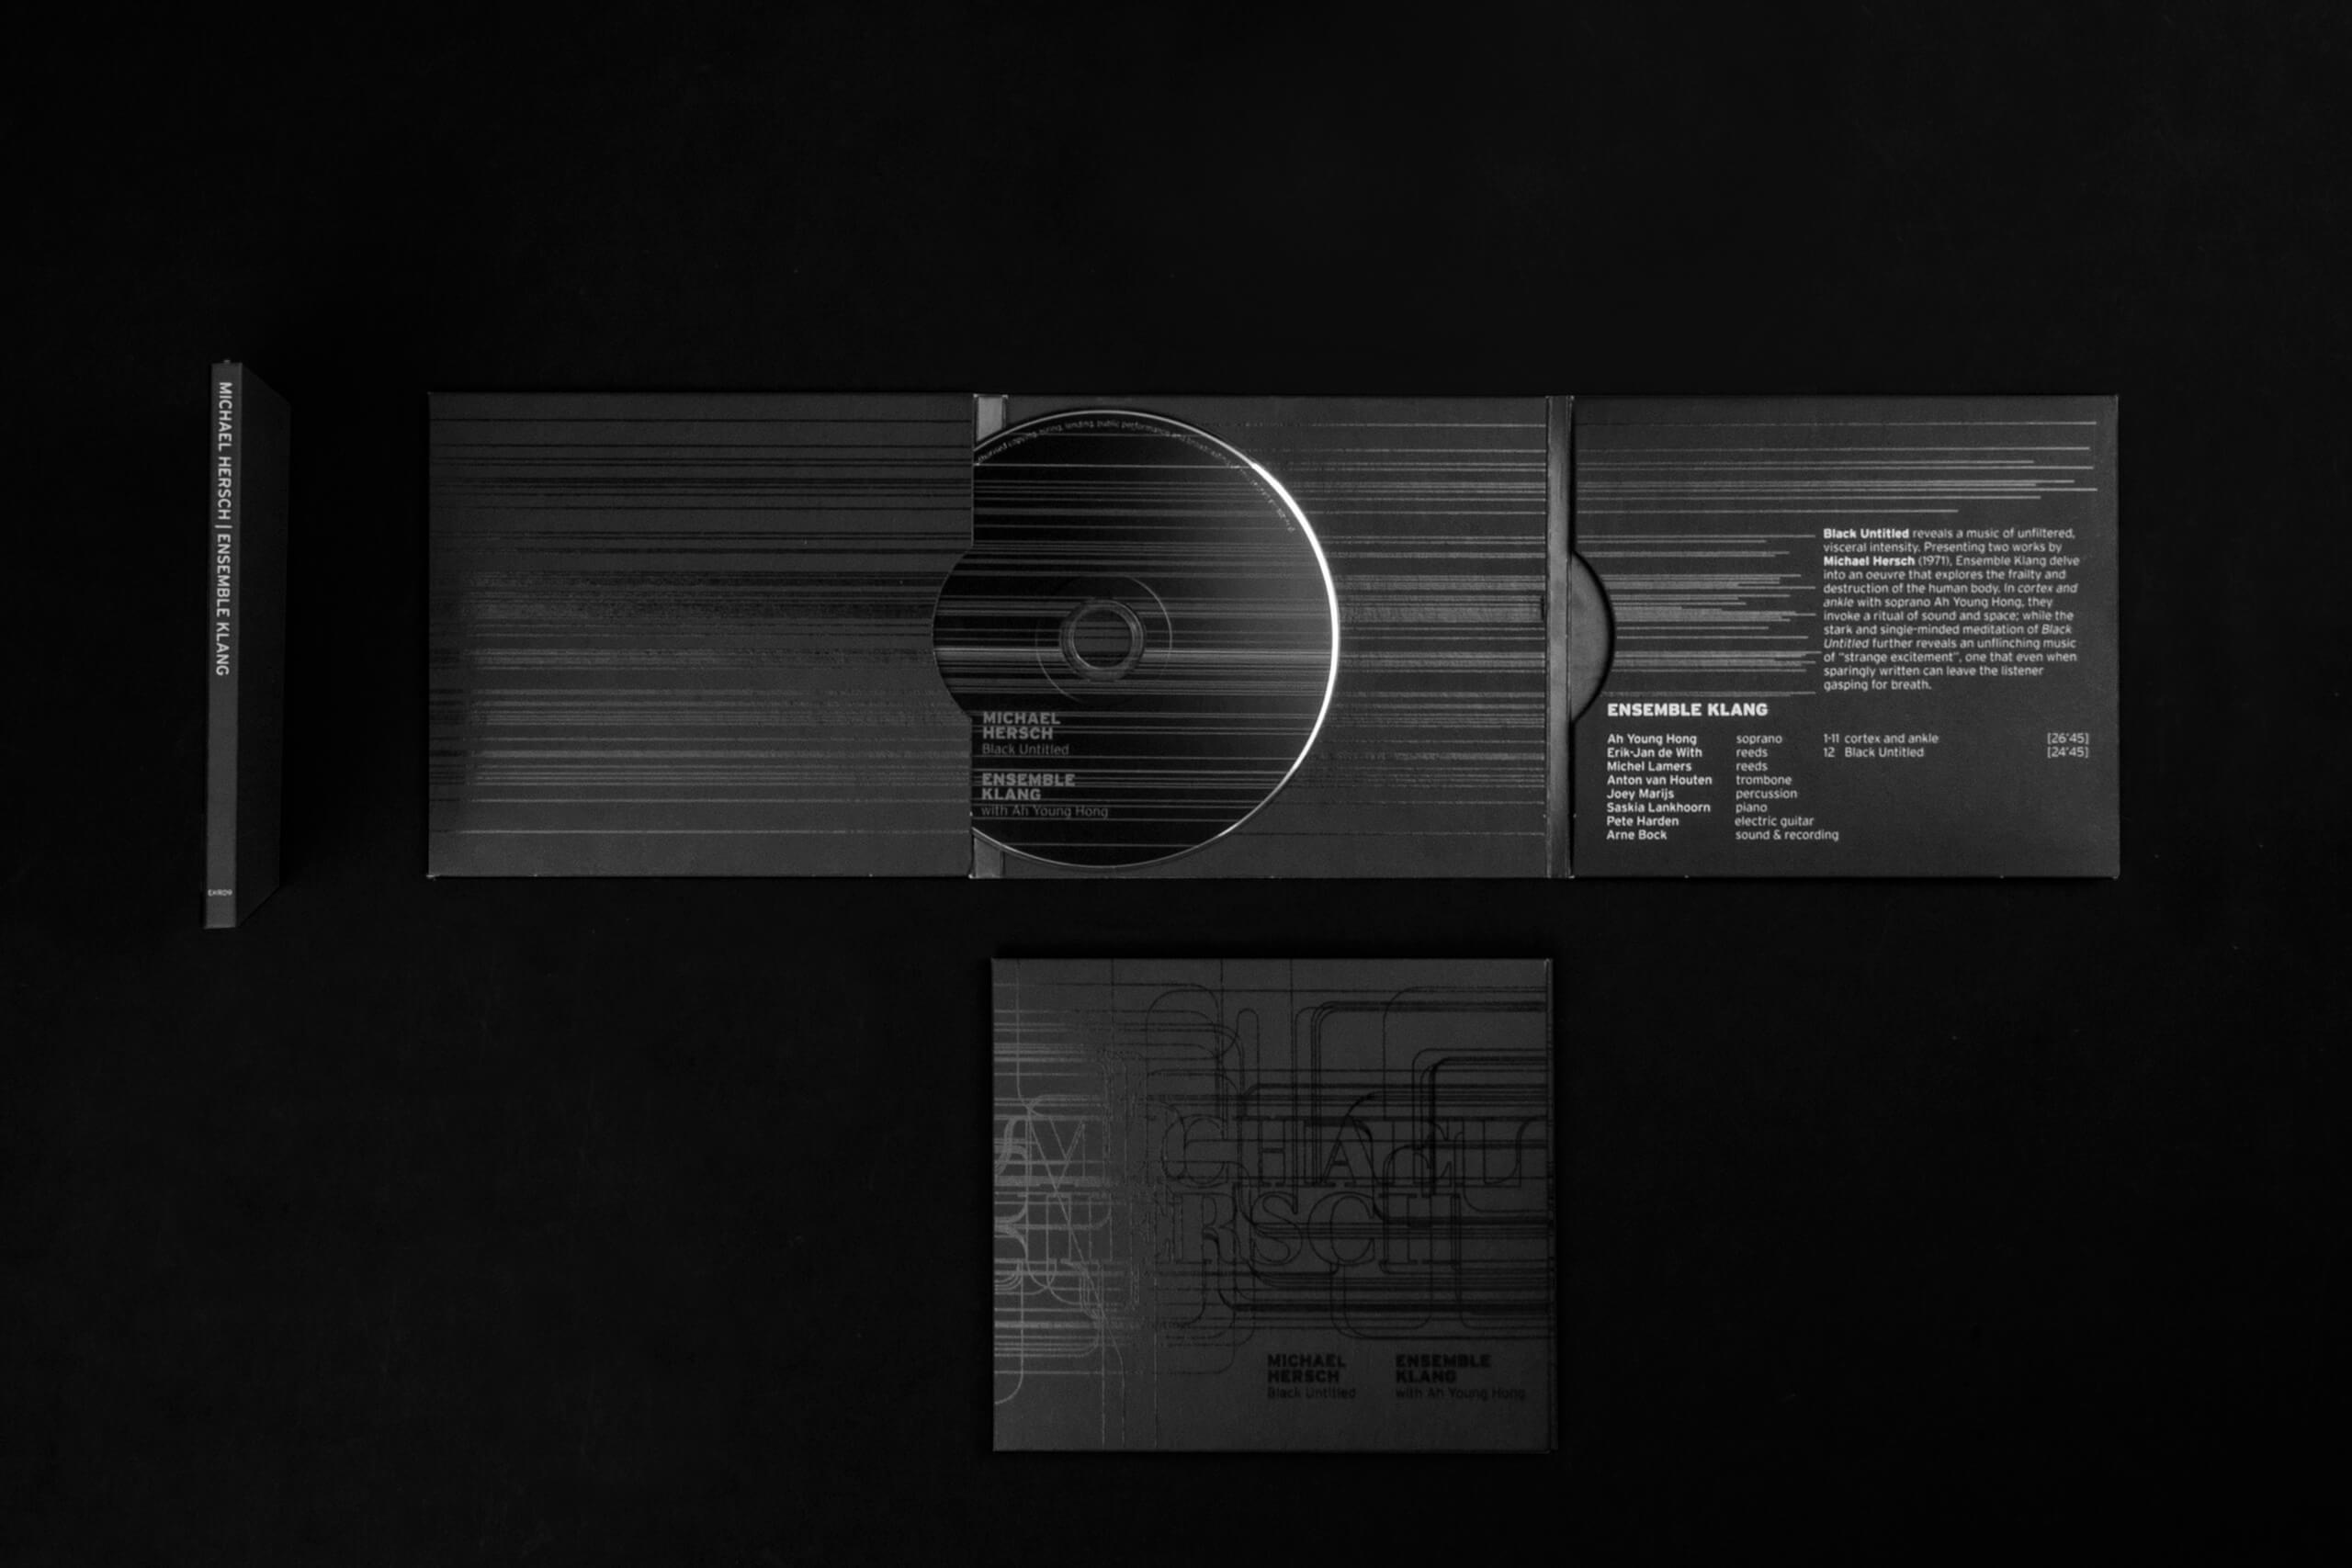 Klang, black on black, graphic Design, Studio Duel